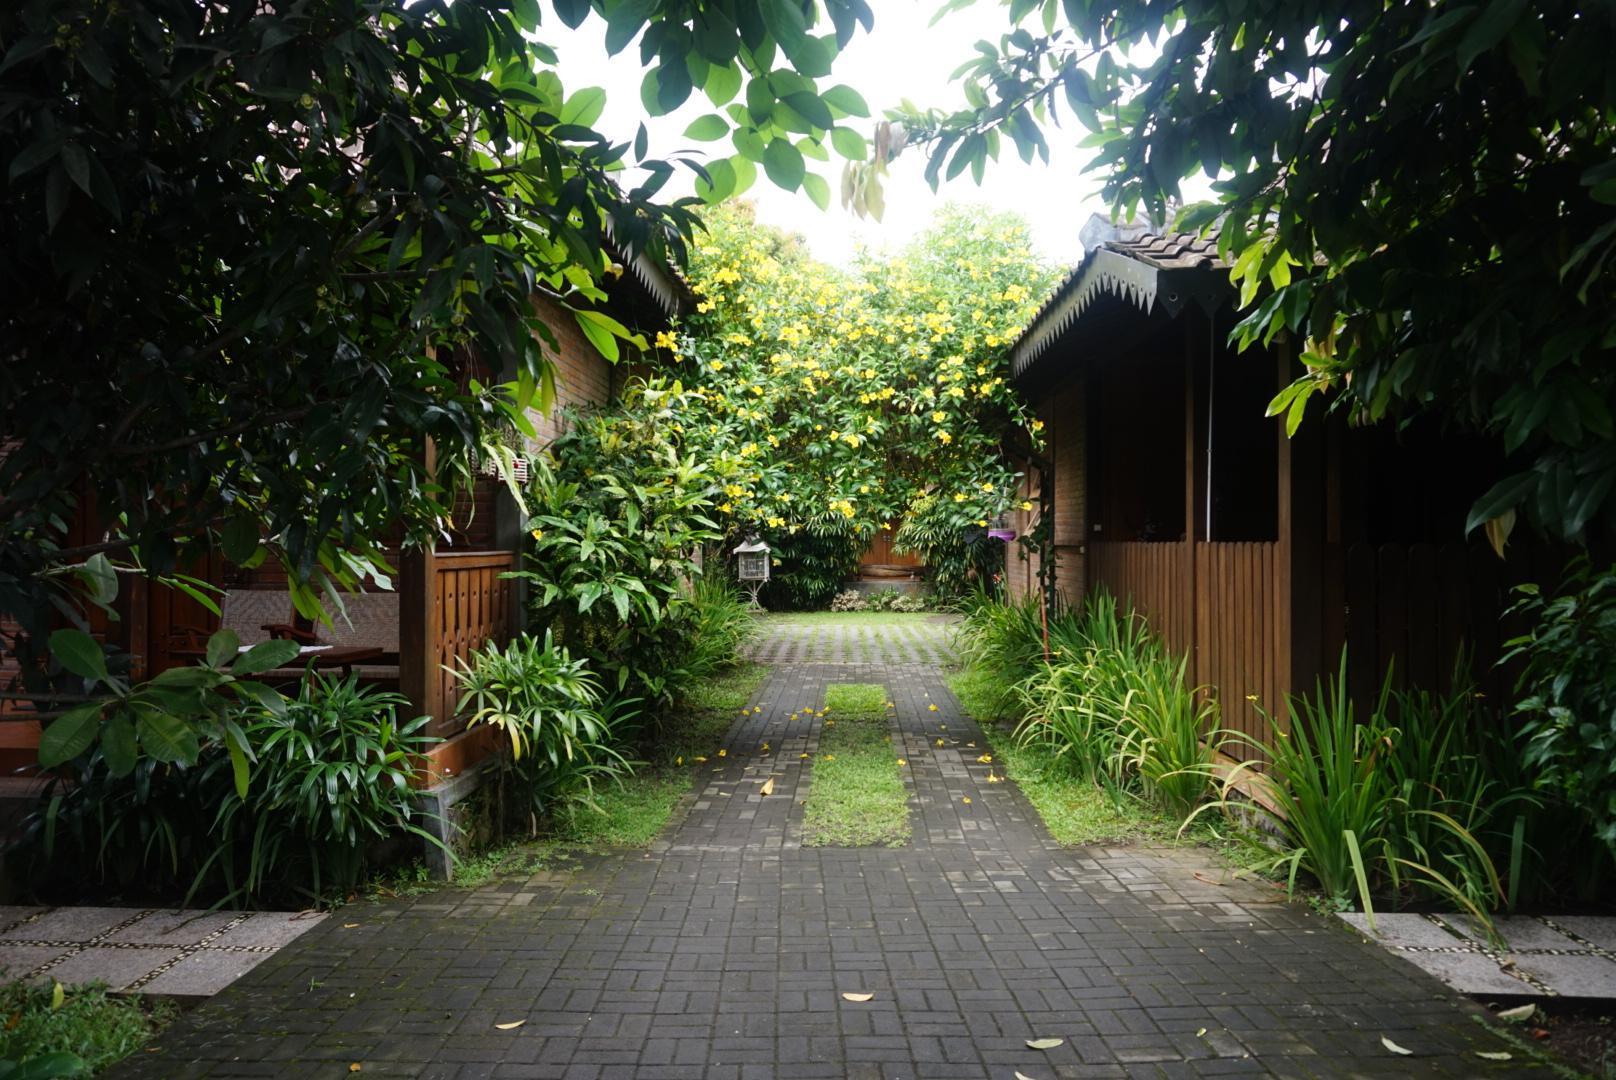 Ndalem Suryo Saptono Room Bima